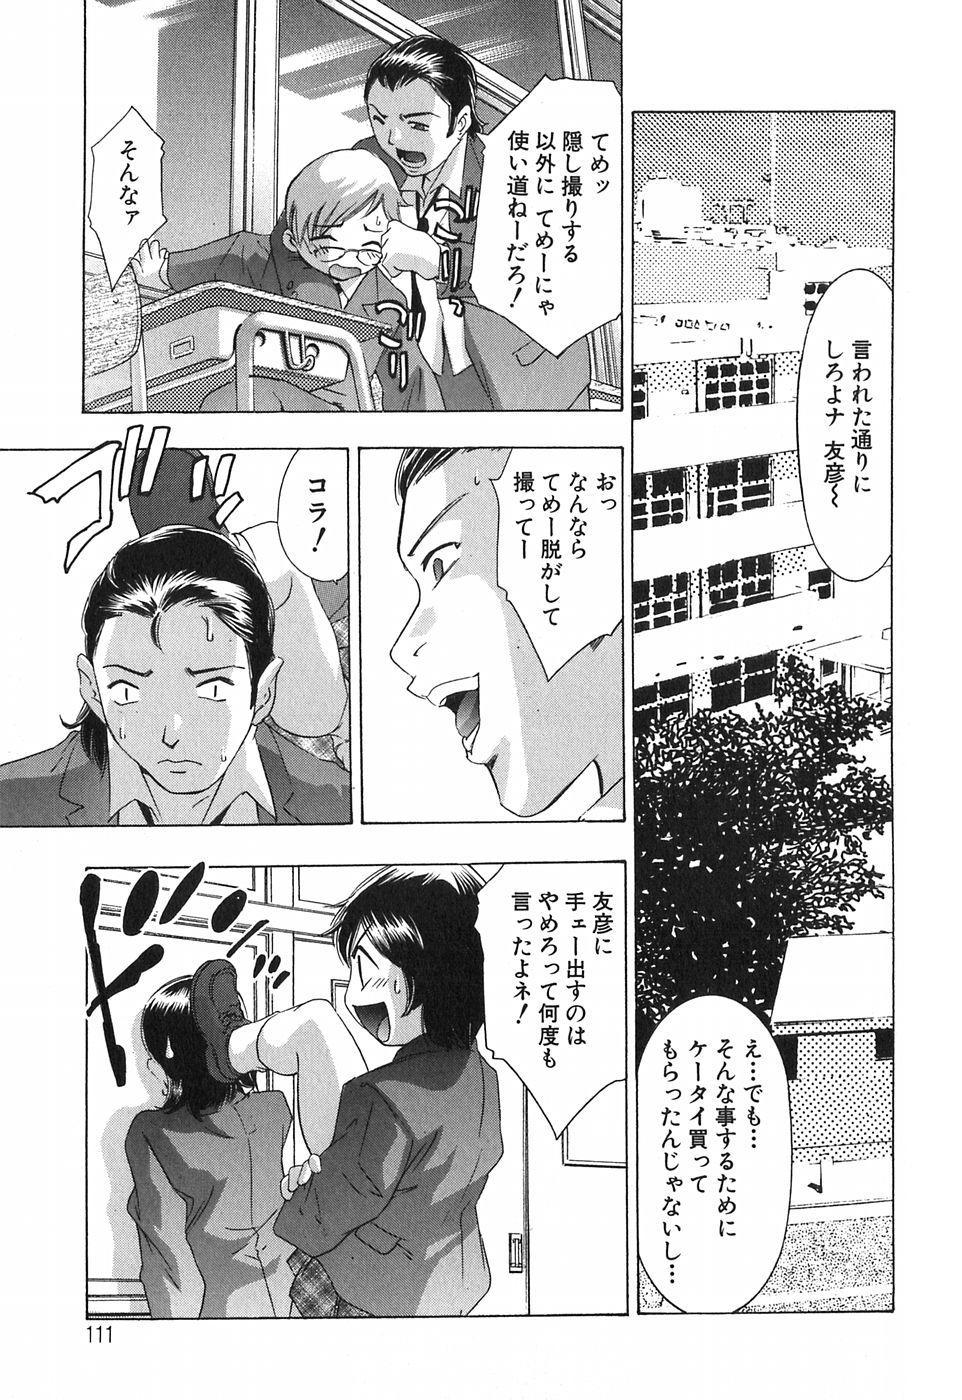 Uchi Naru Koe - Voice which becomes inside 110